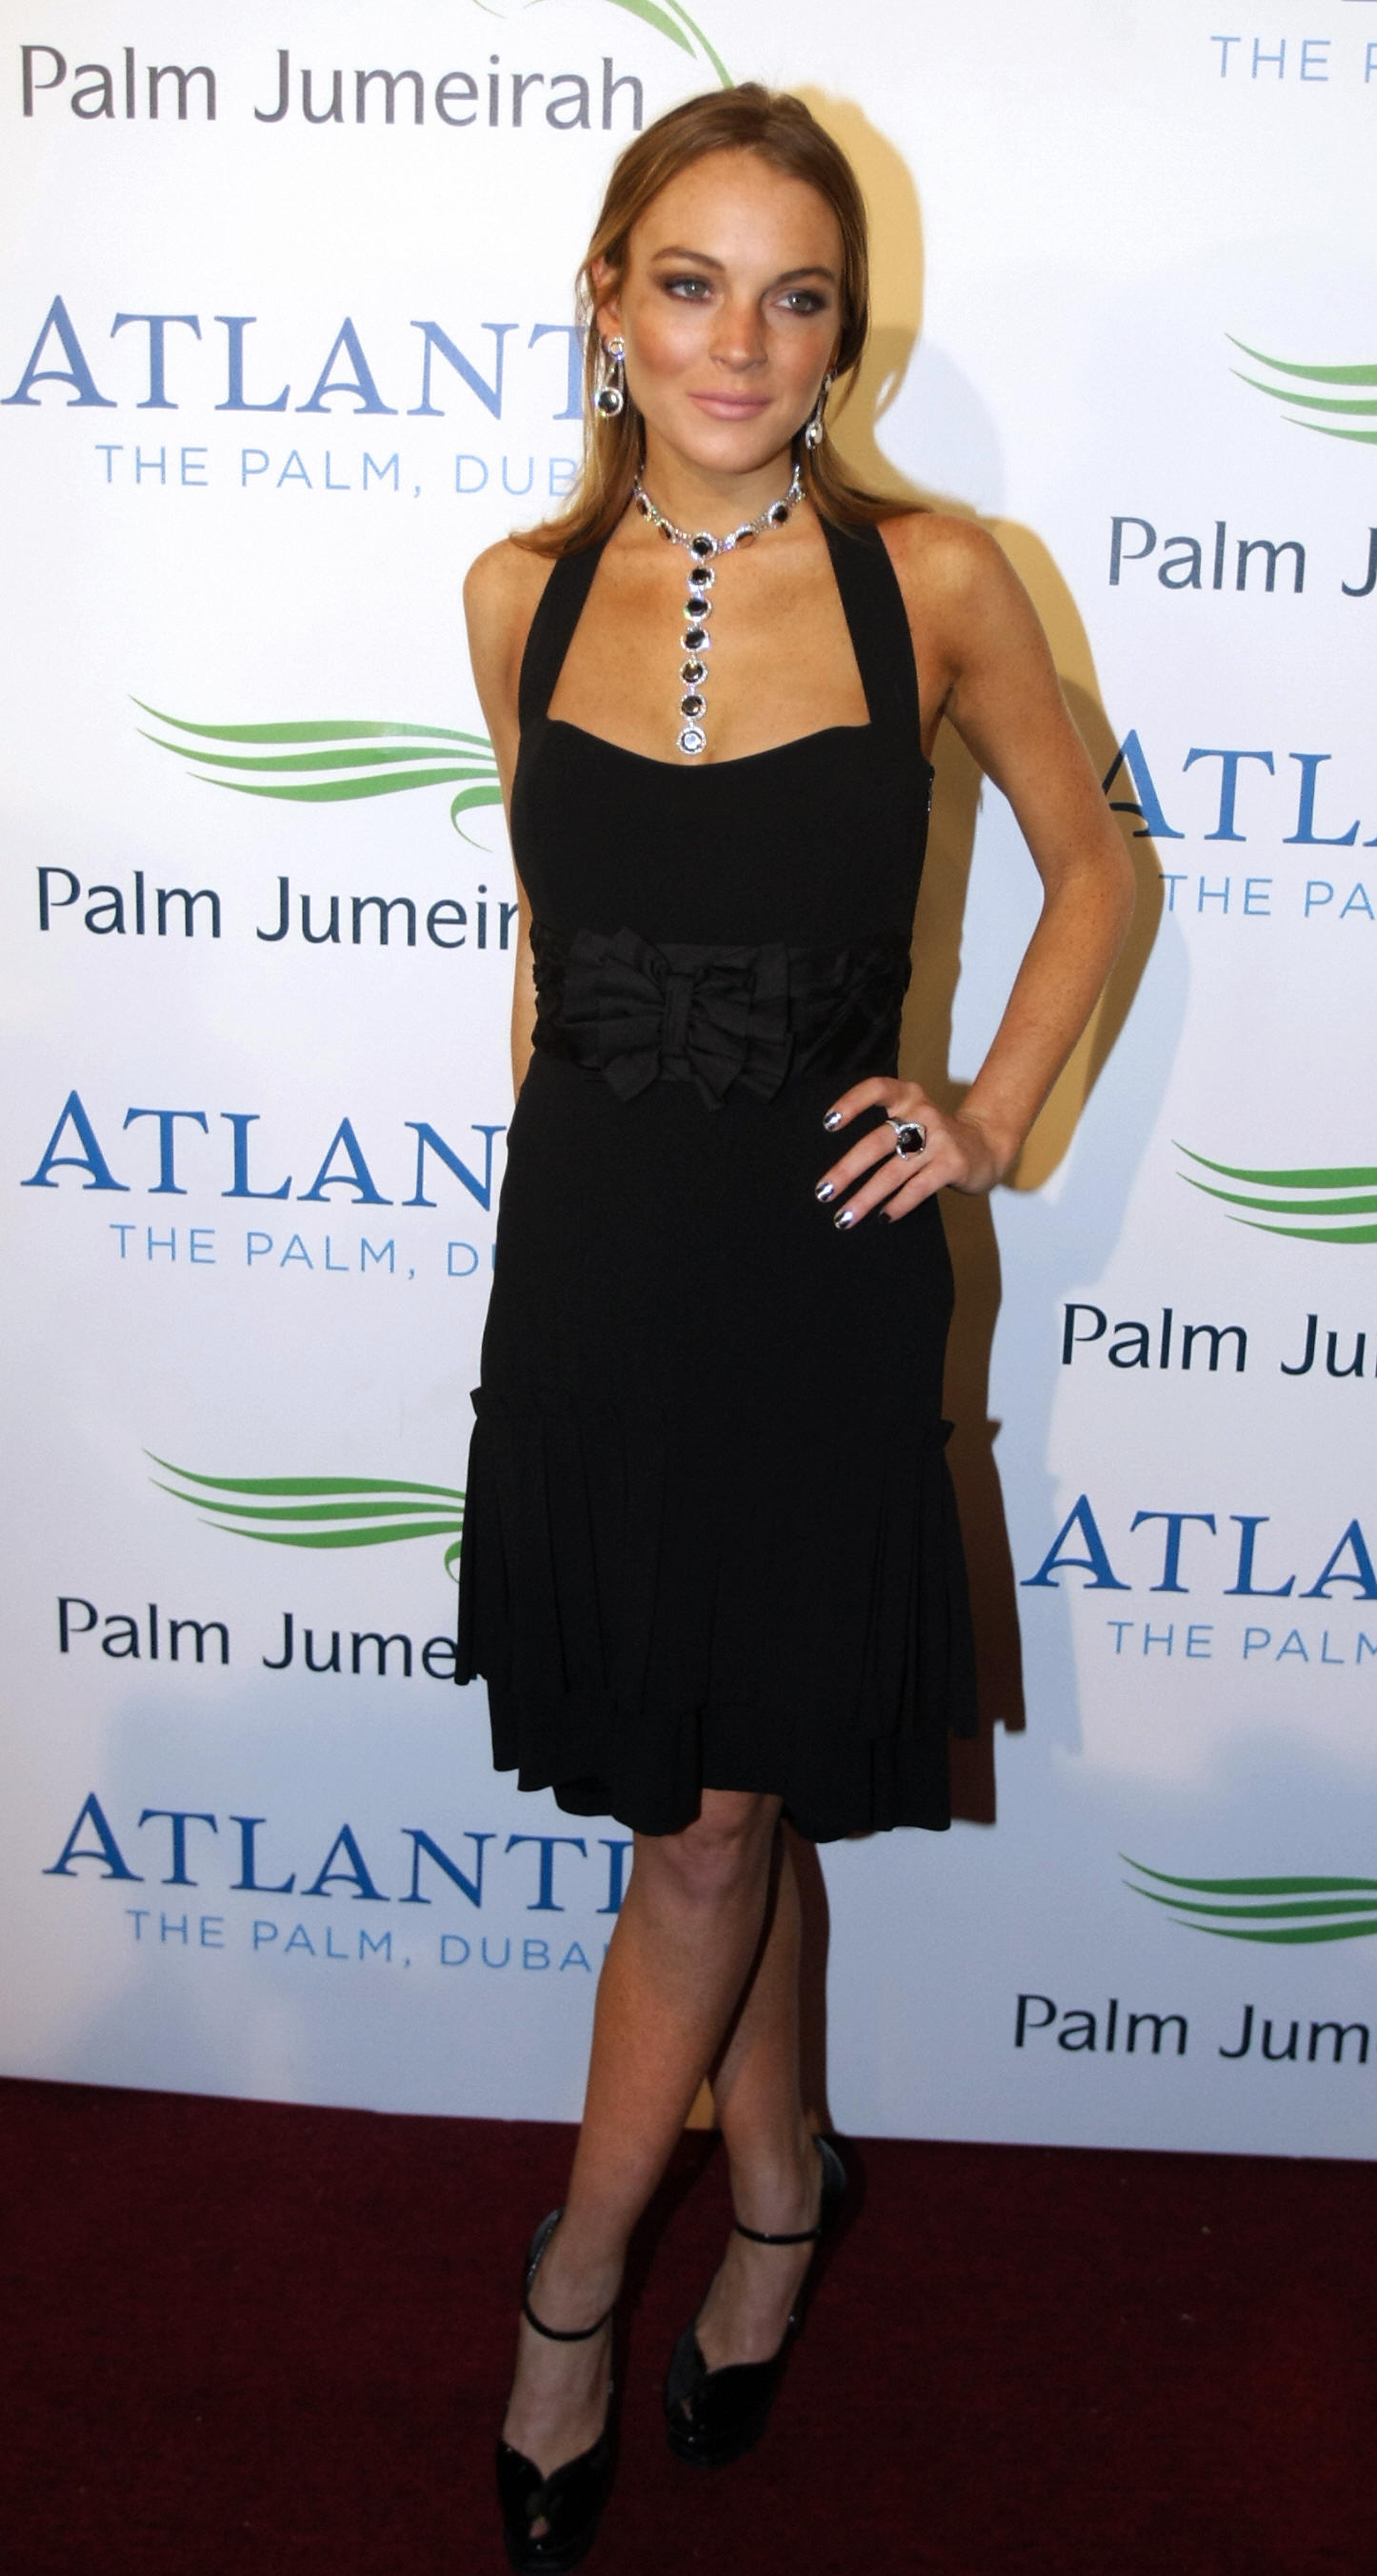 Lindsay Lohan, Atlantis Hotel